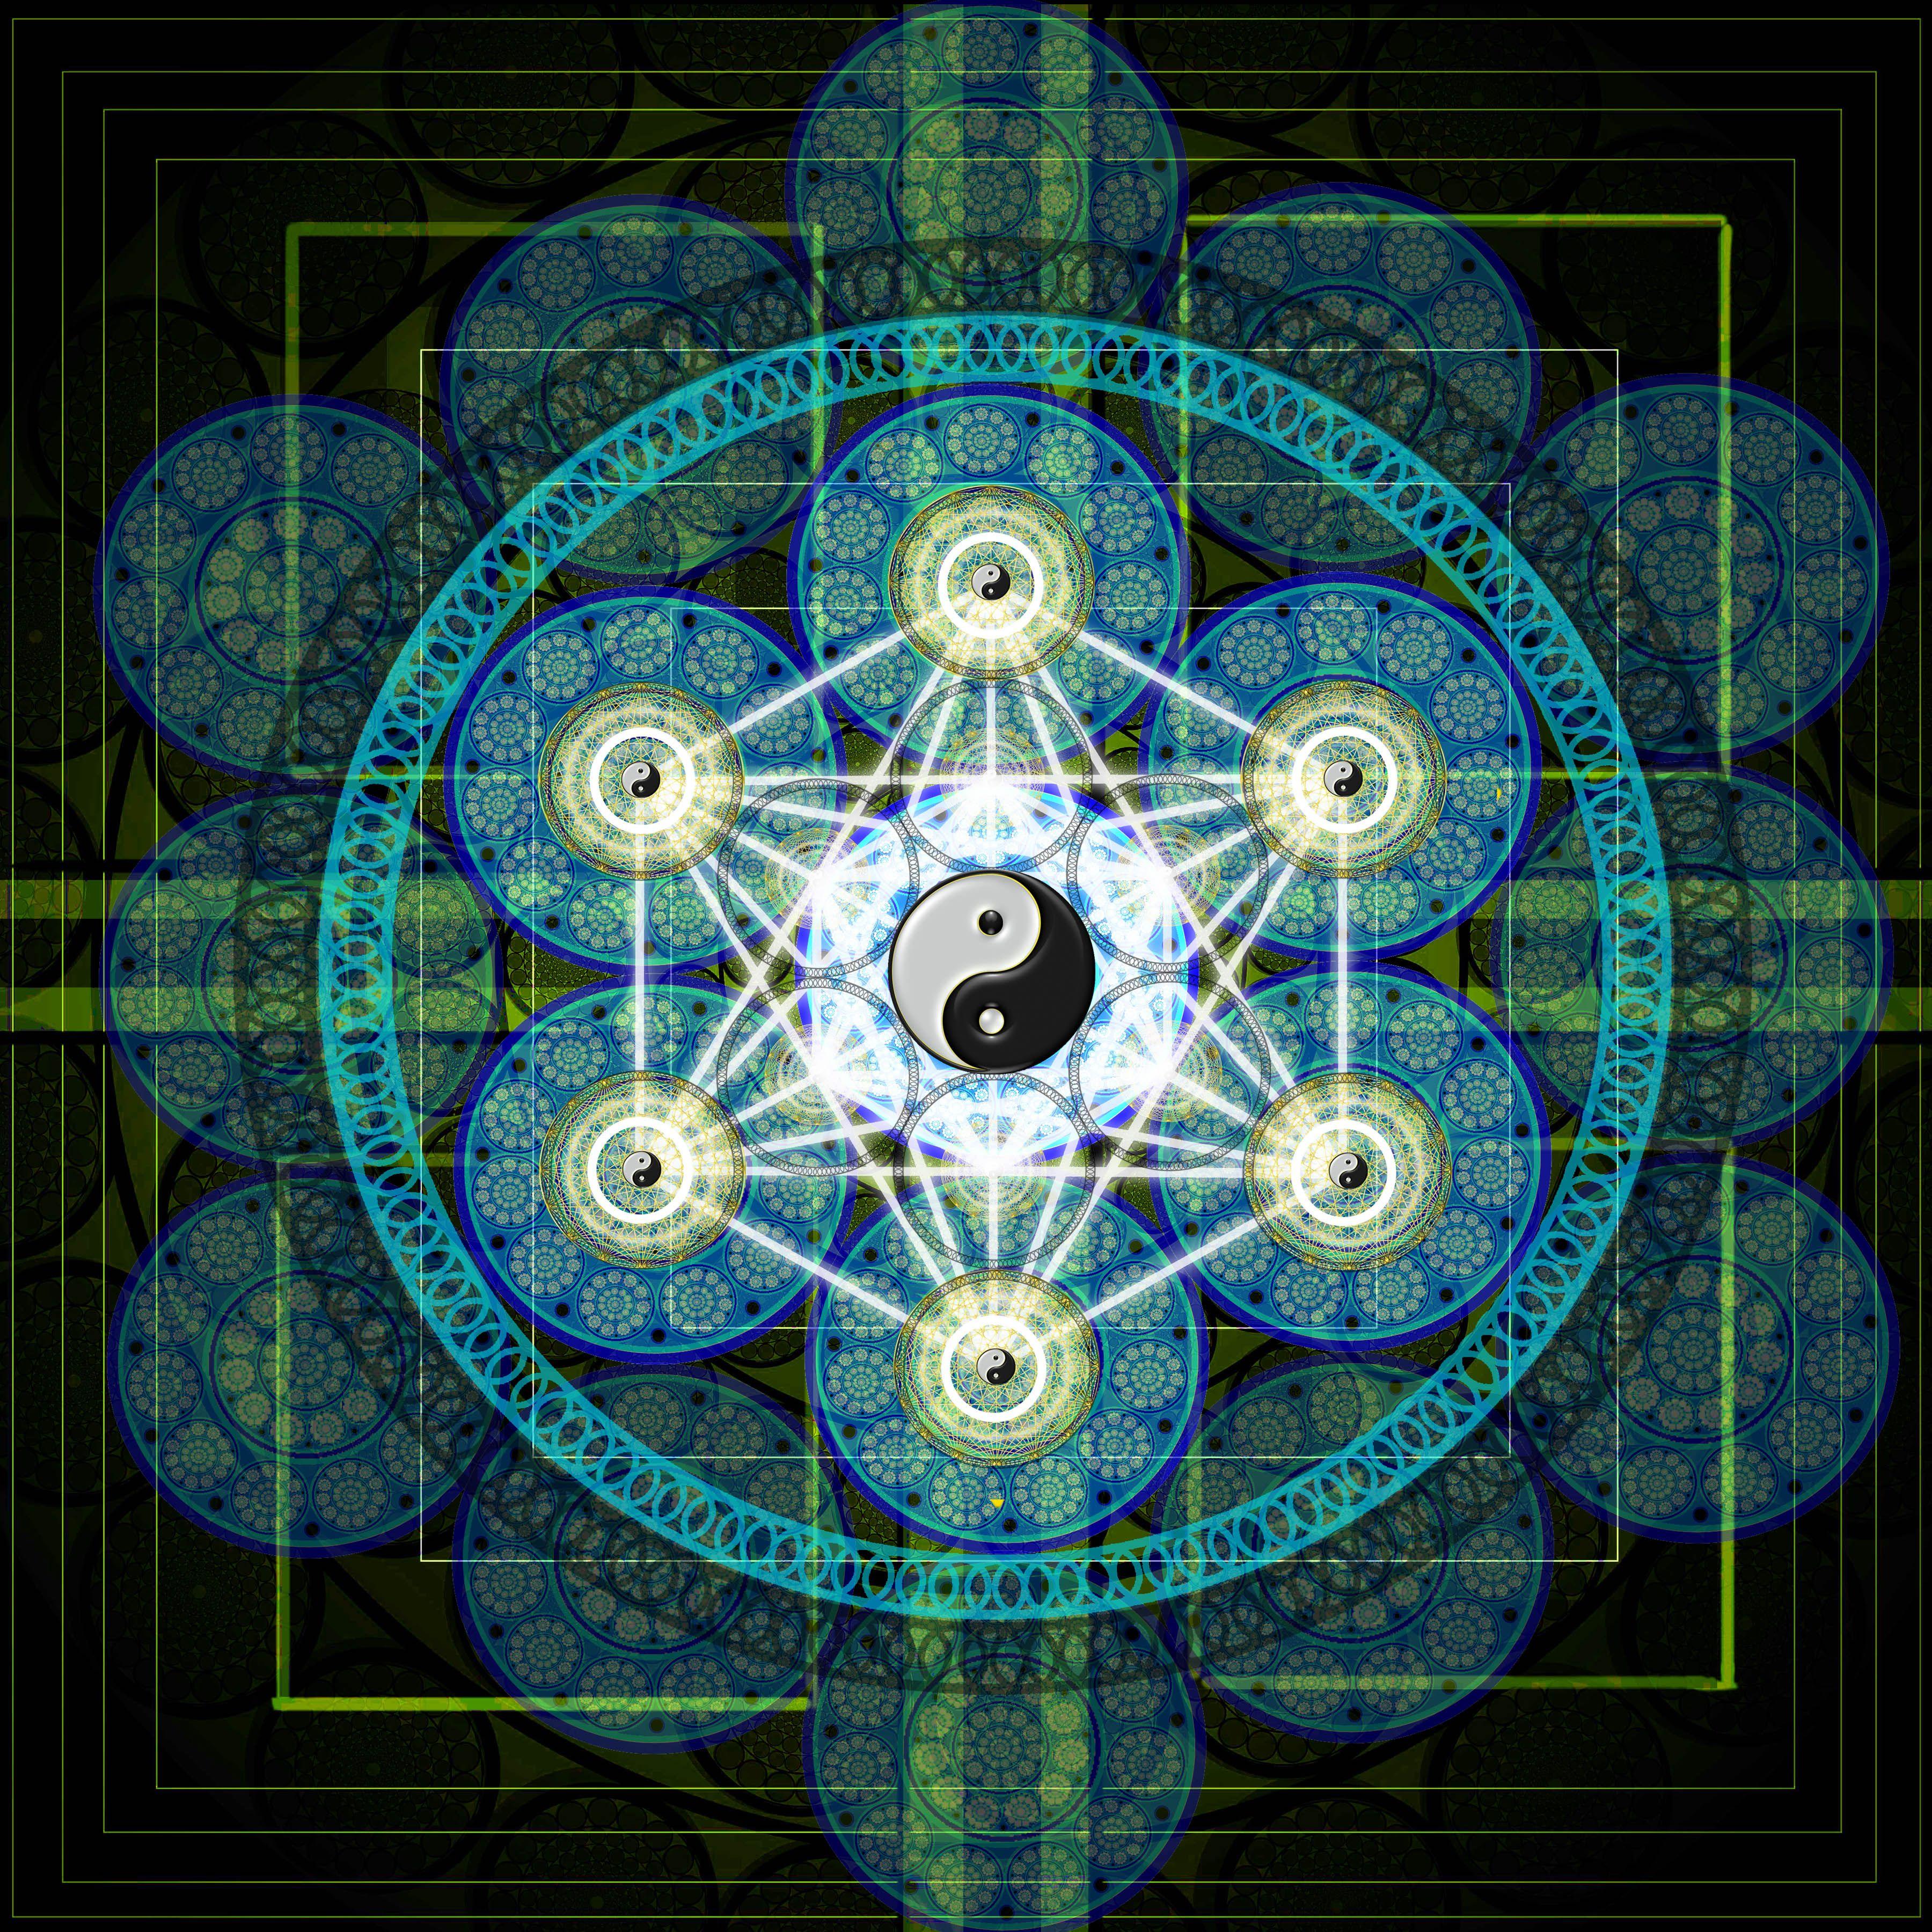 Love atrracting sybols or sacred geometry sacred geometry love atrracting sybols or sacred geometry sacred geometry sacredgeometry2byneosoul god can be biocorpaavc